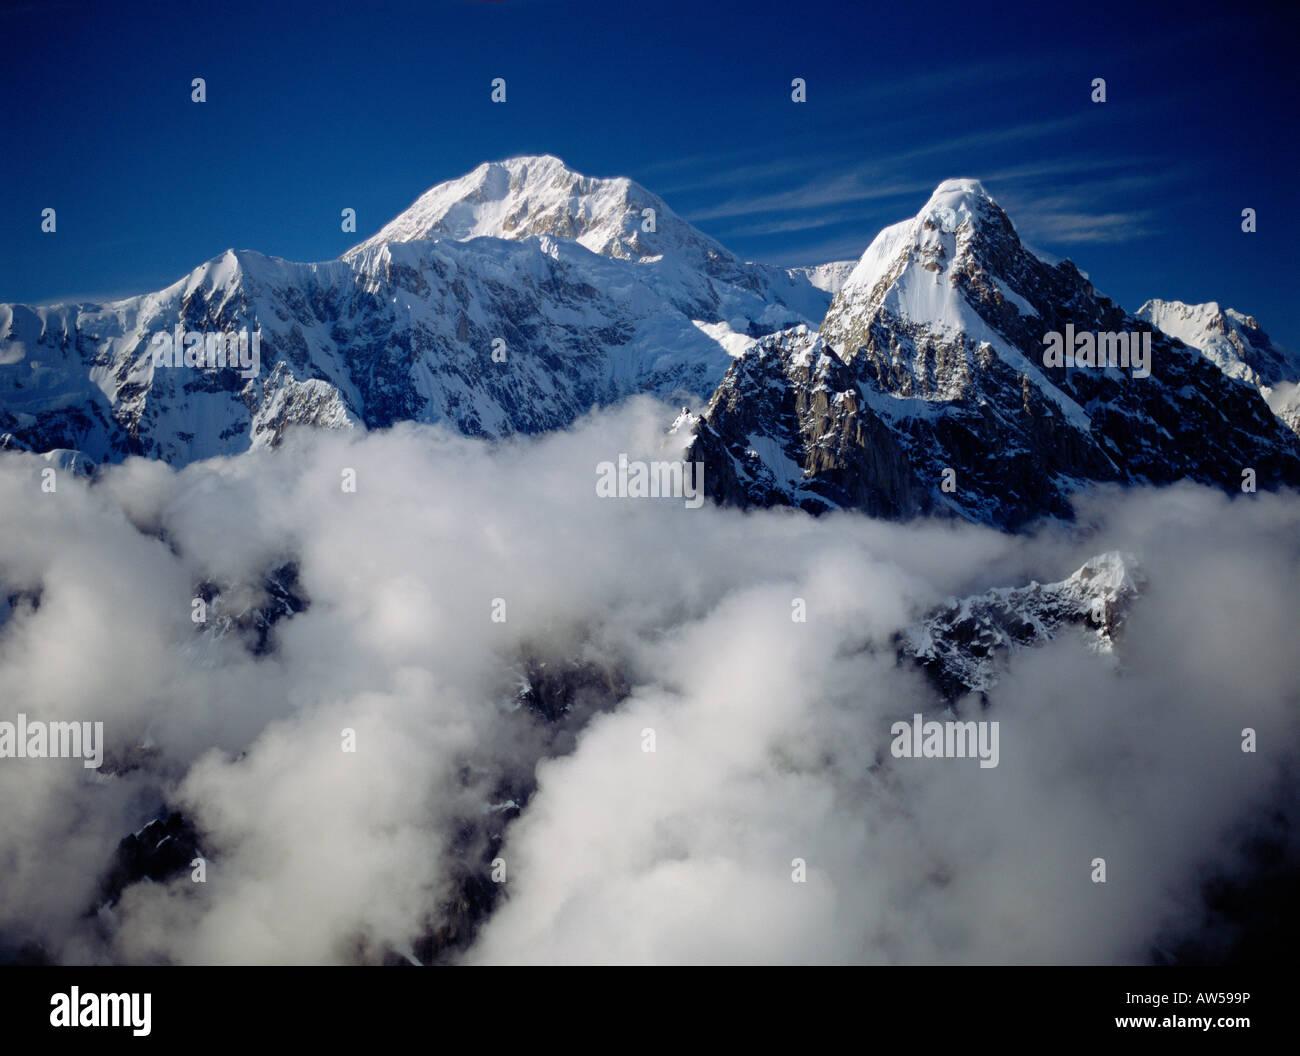 Alaska United States of America - Stock Image